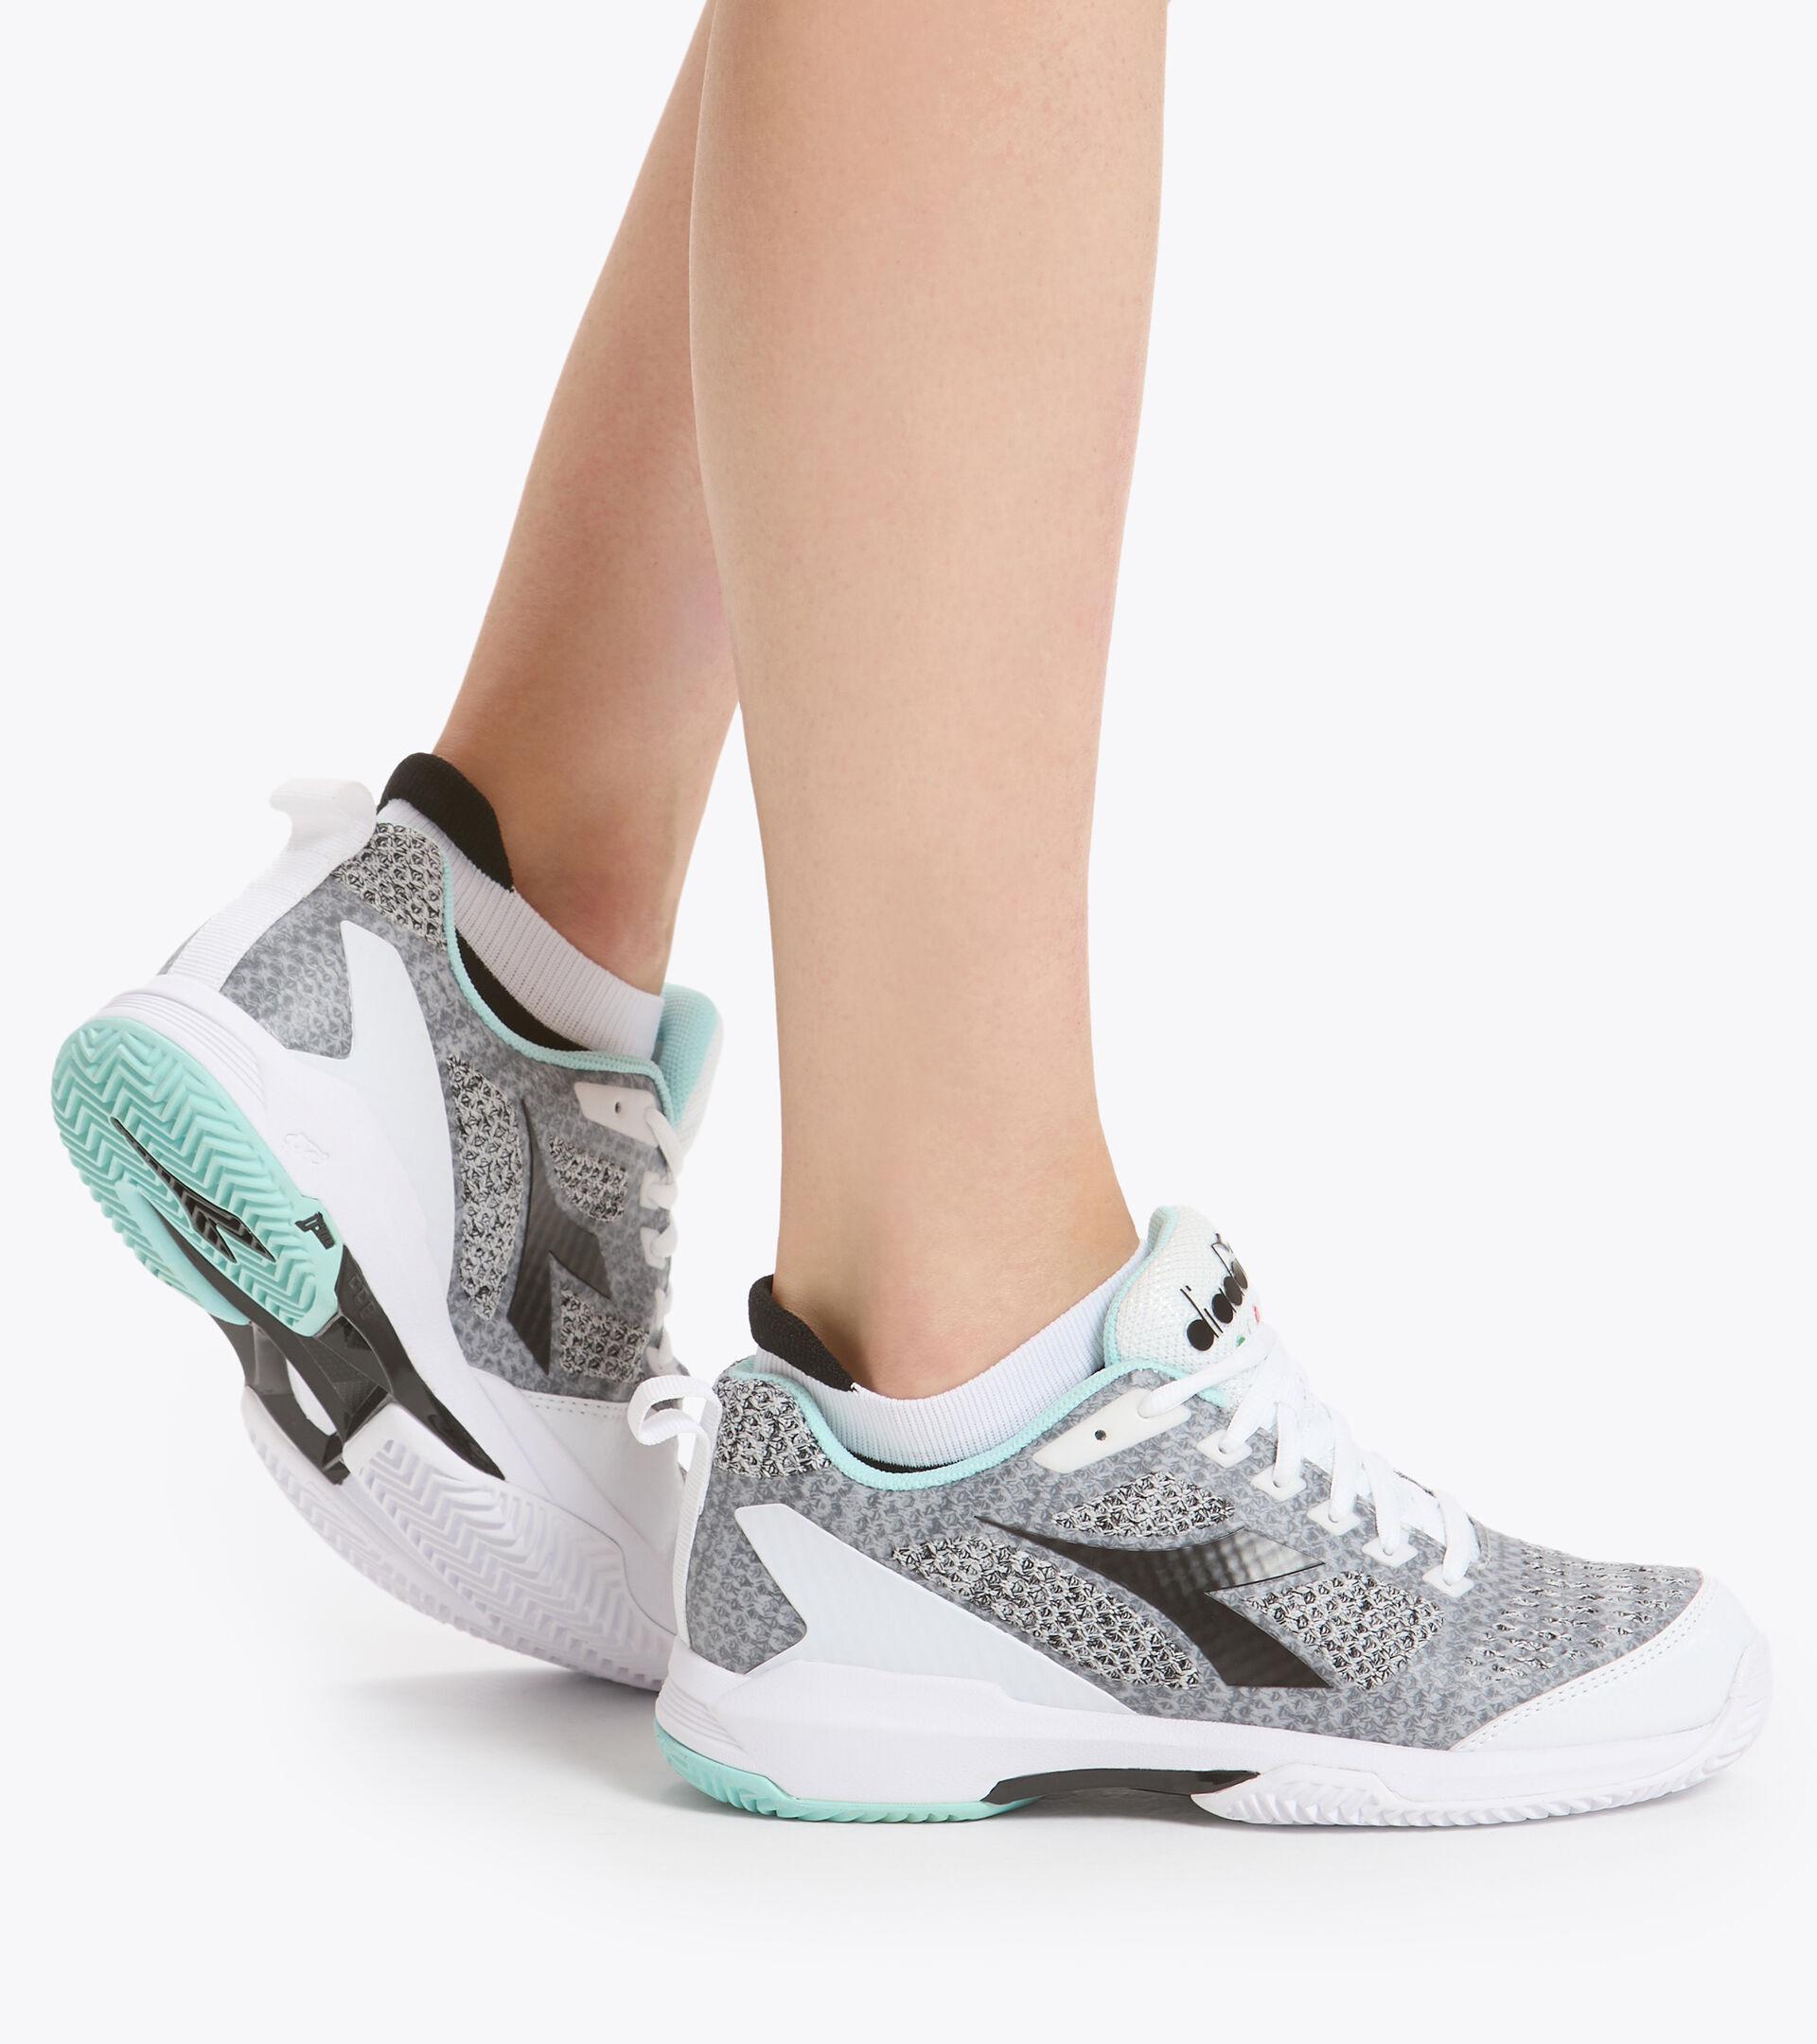 Footwear Sport DONNA S.SHOT 2 W CLAY BCO/GRIGIO ACIAIO/AZZURRO TINT Diadora